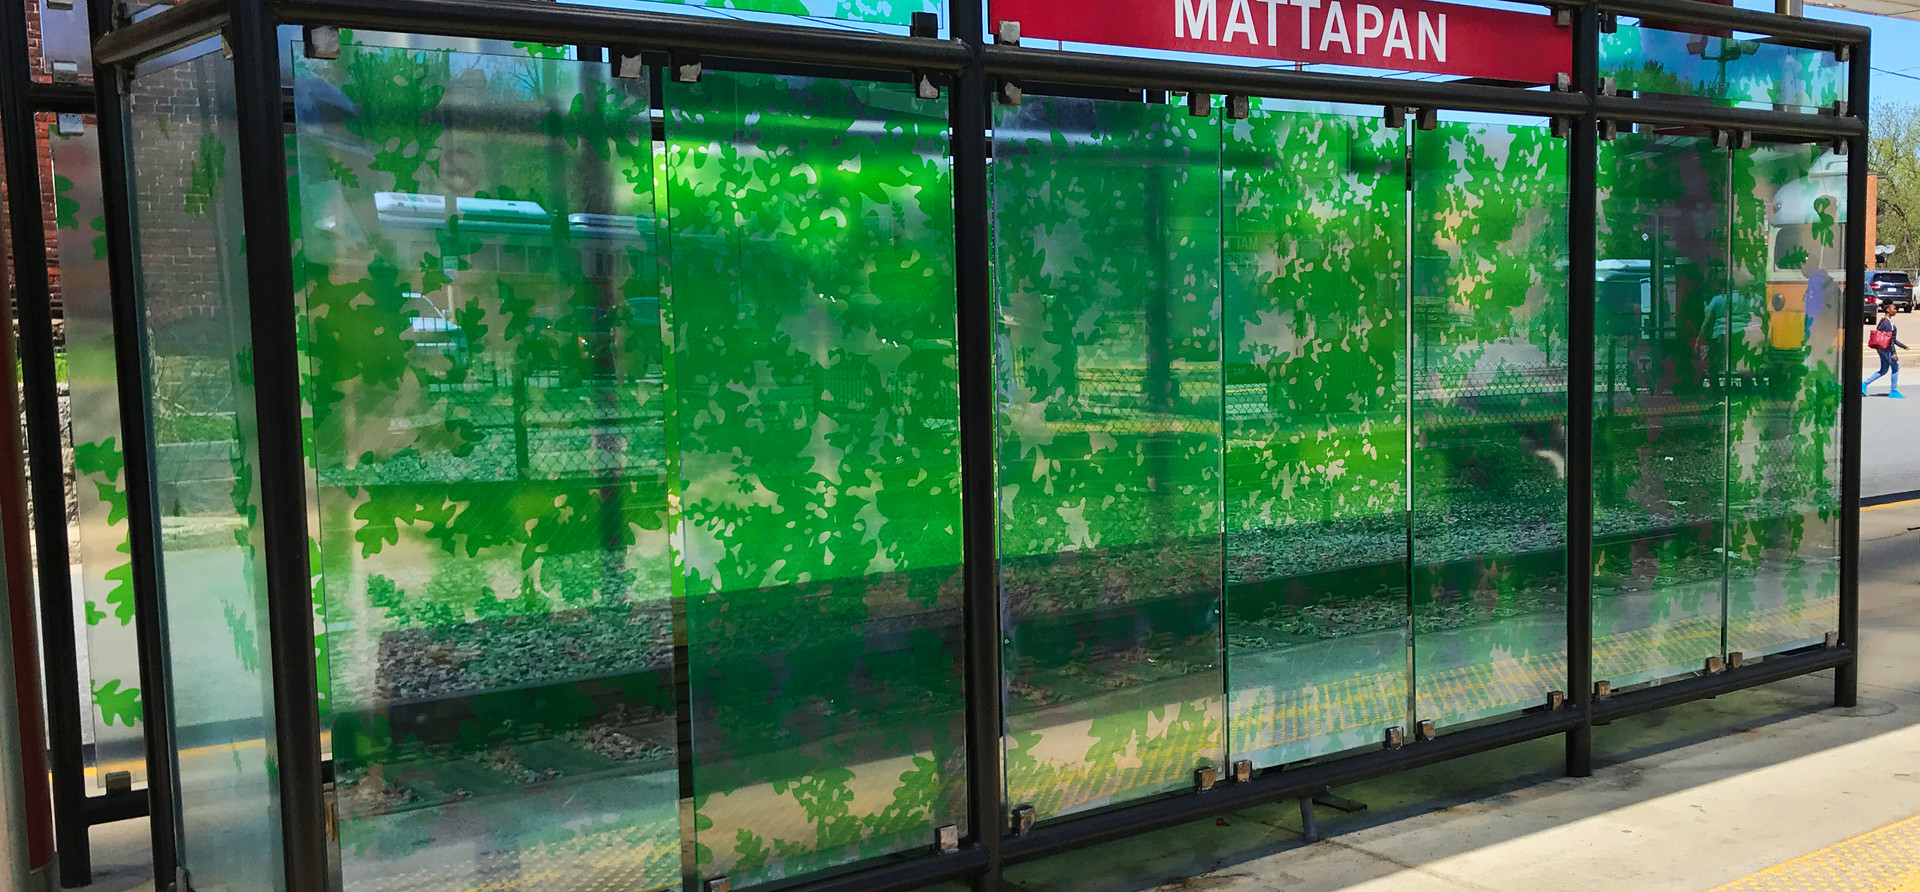 MBTA Vestibule Mattapan